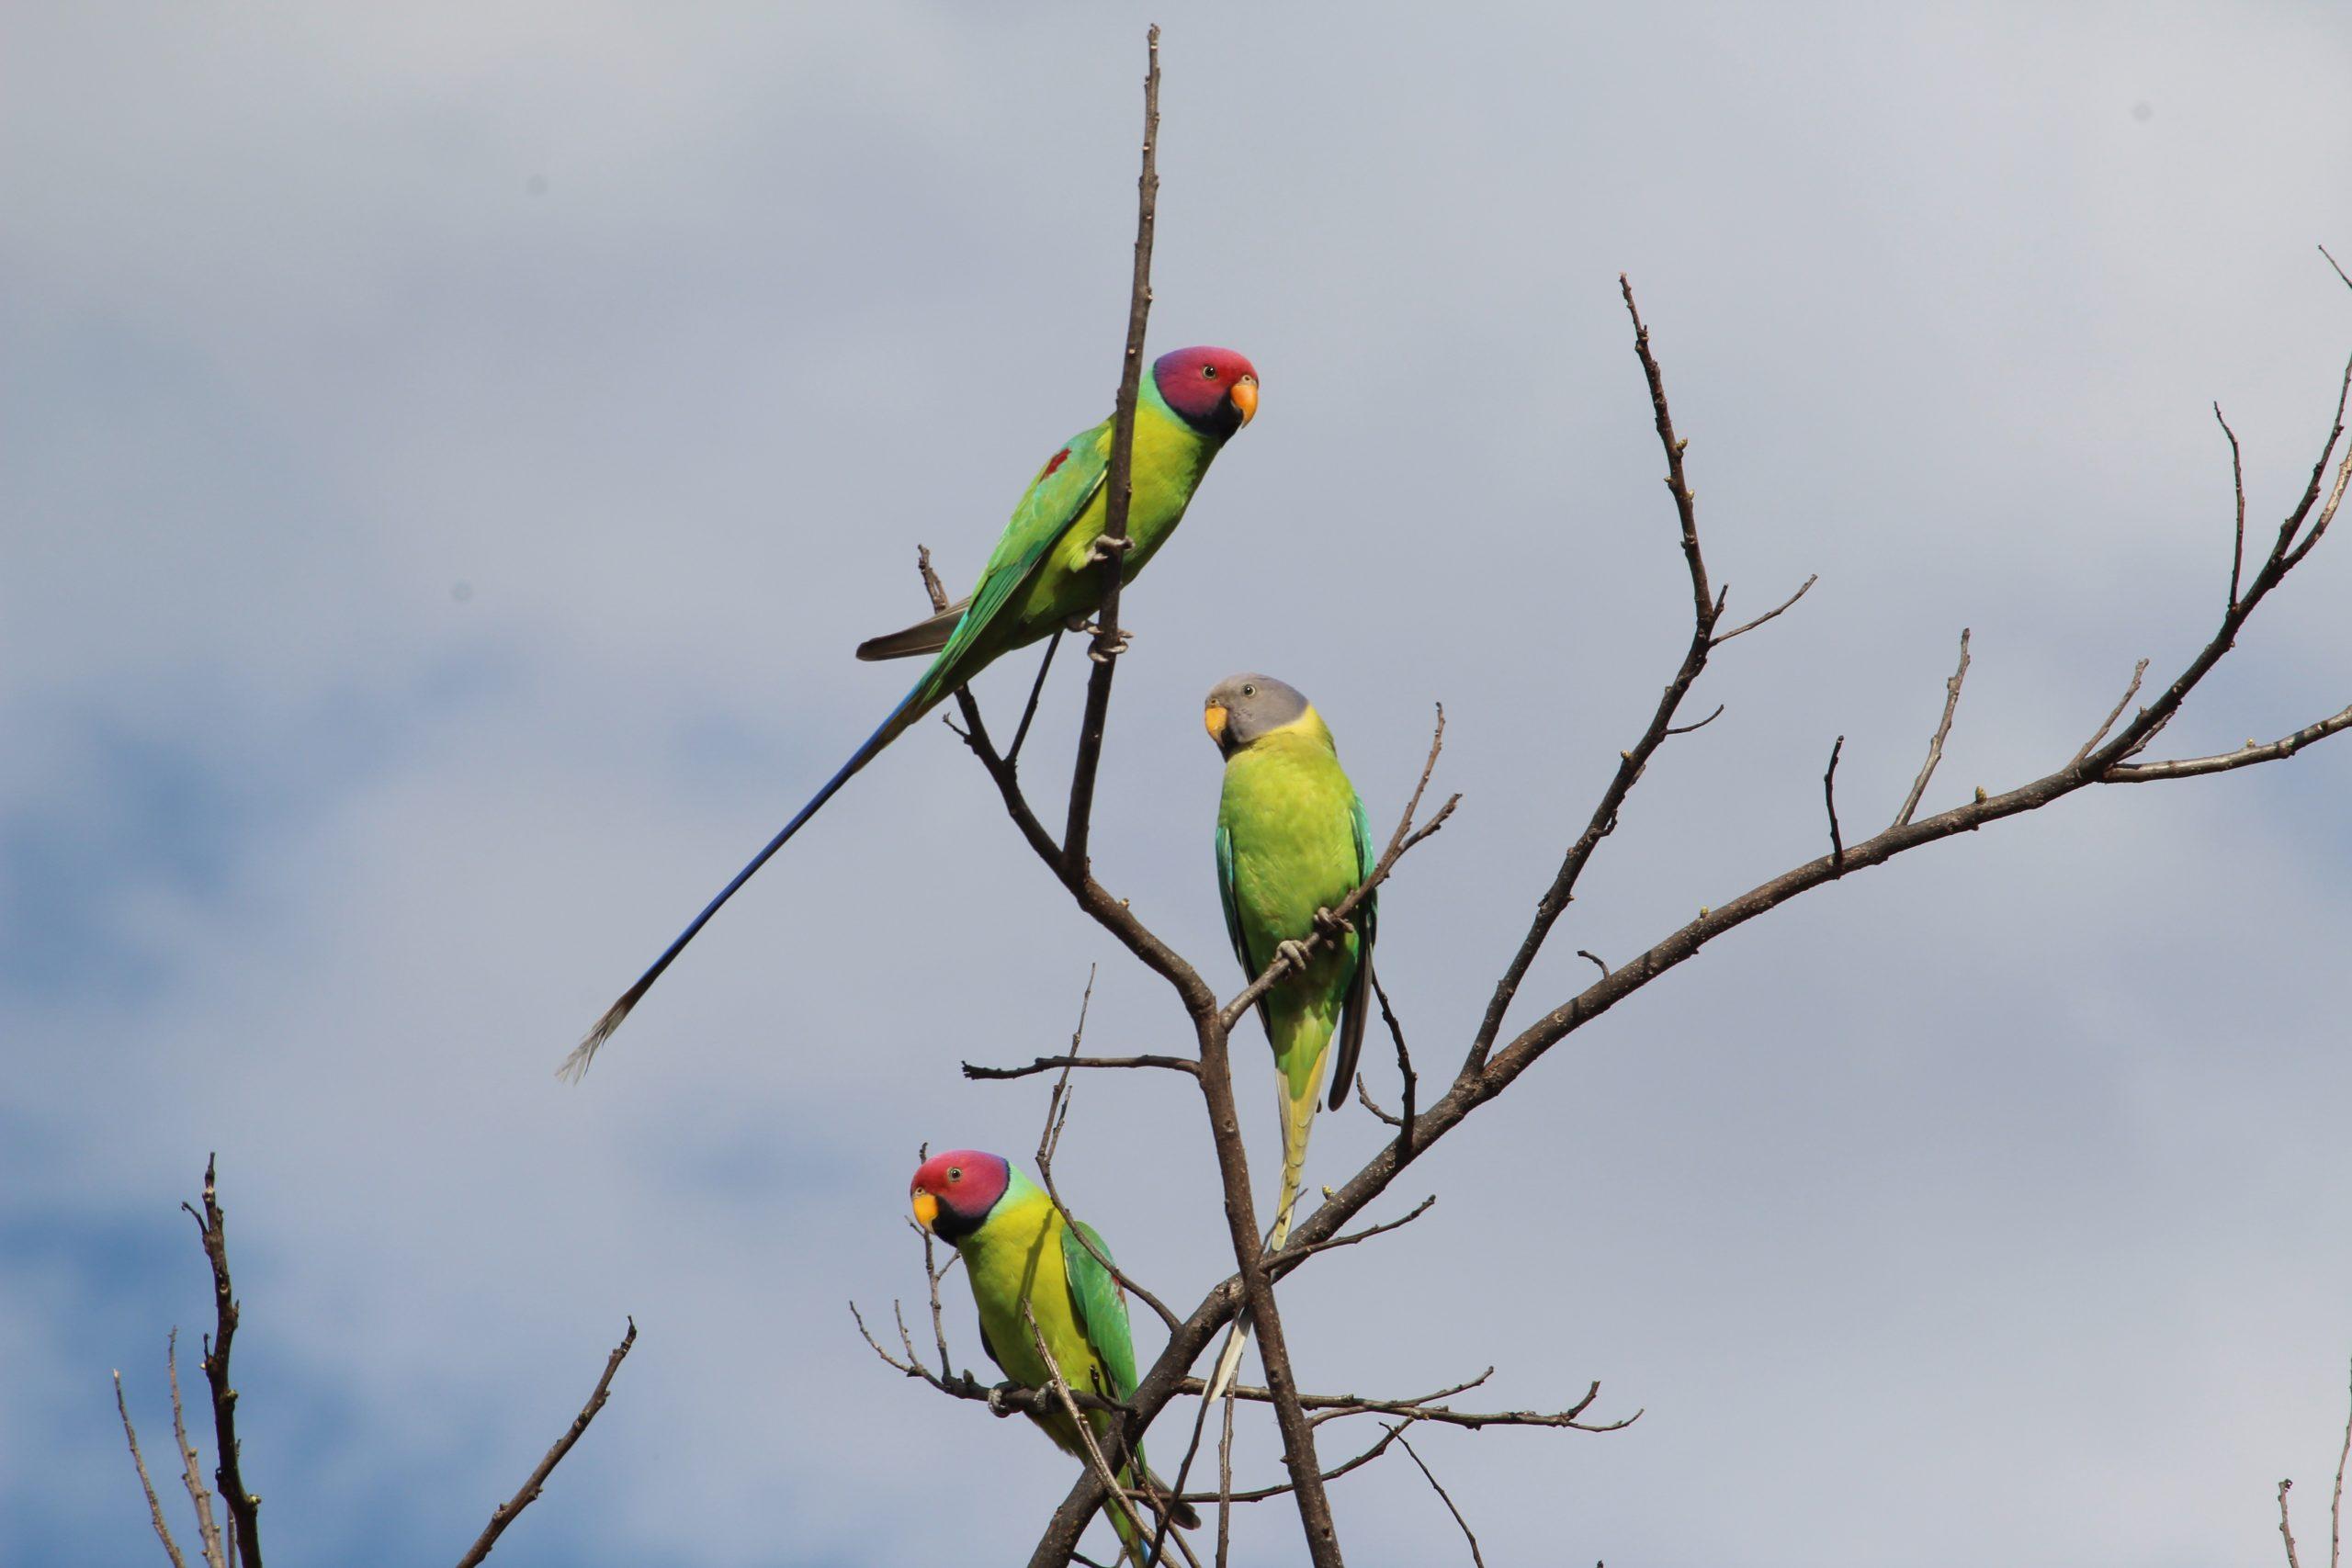 Parrots on a dry plant